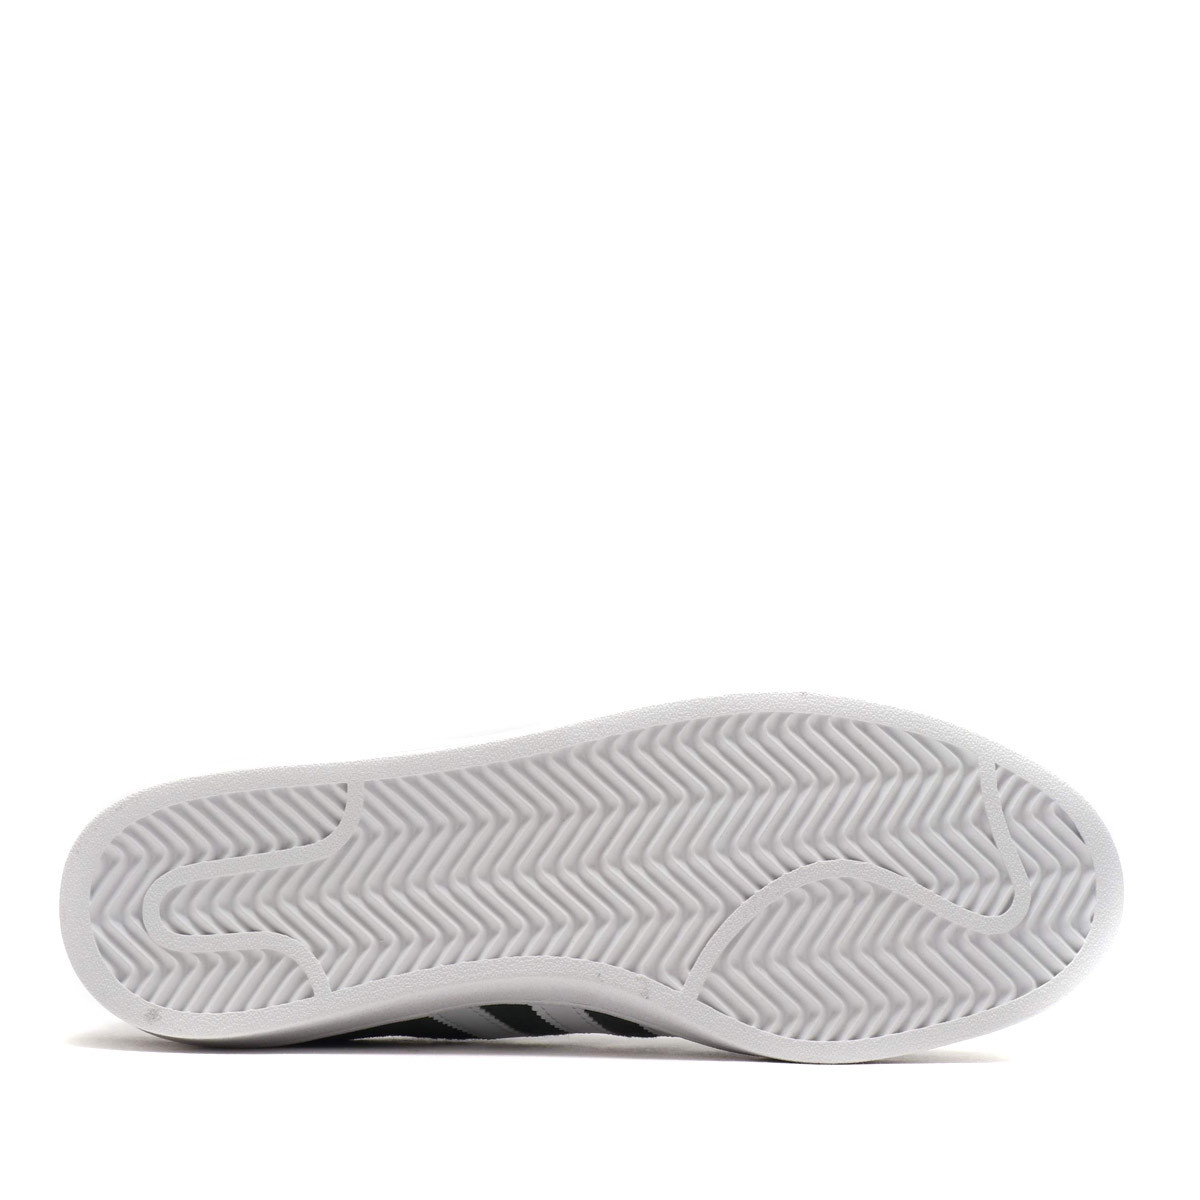 27.5cm●アディダス オリジナルス キャンパス オリーブ グレー LEGEND IVY adidas Originals CAMPUS 80s CM8445 cp スニーカー 定番_画像4